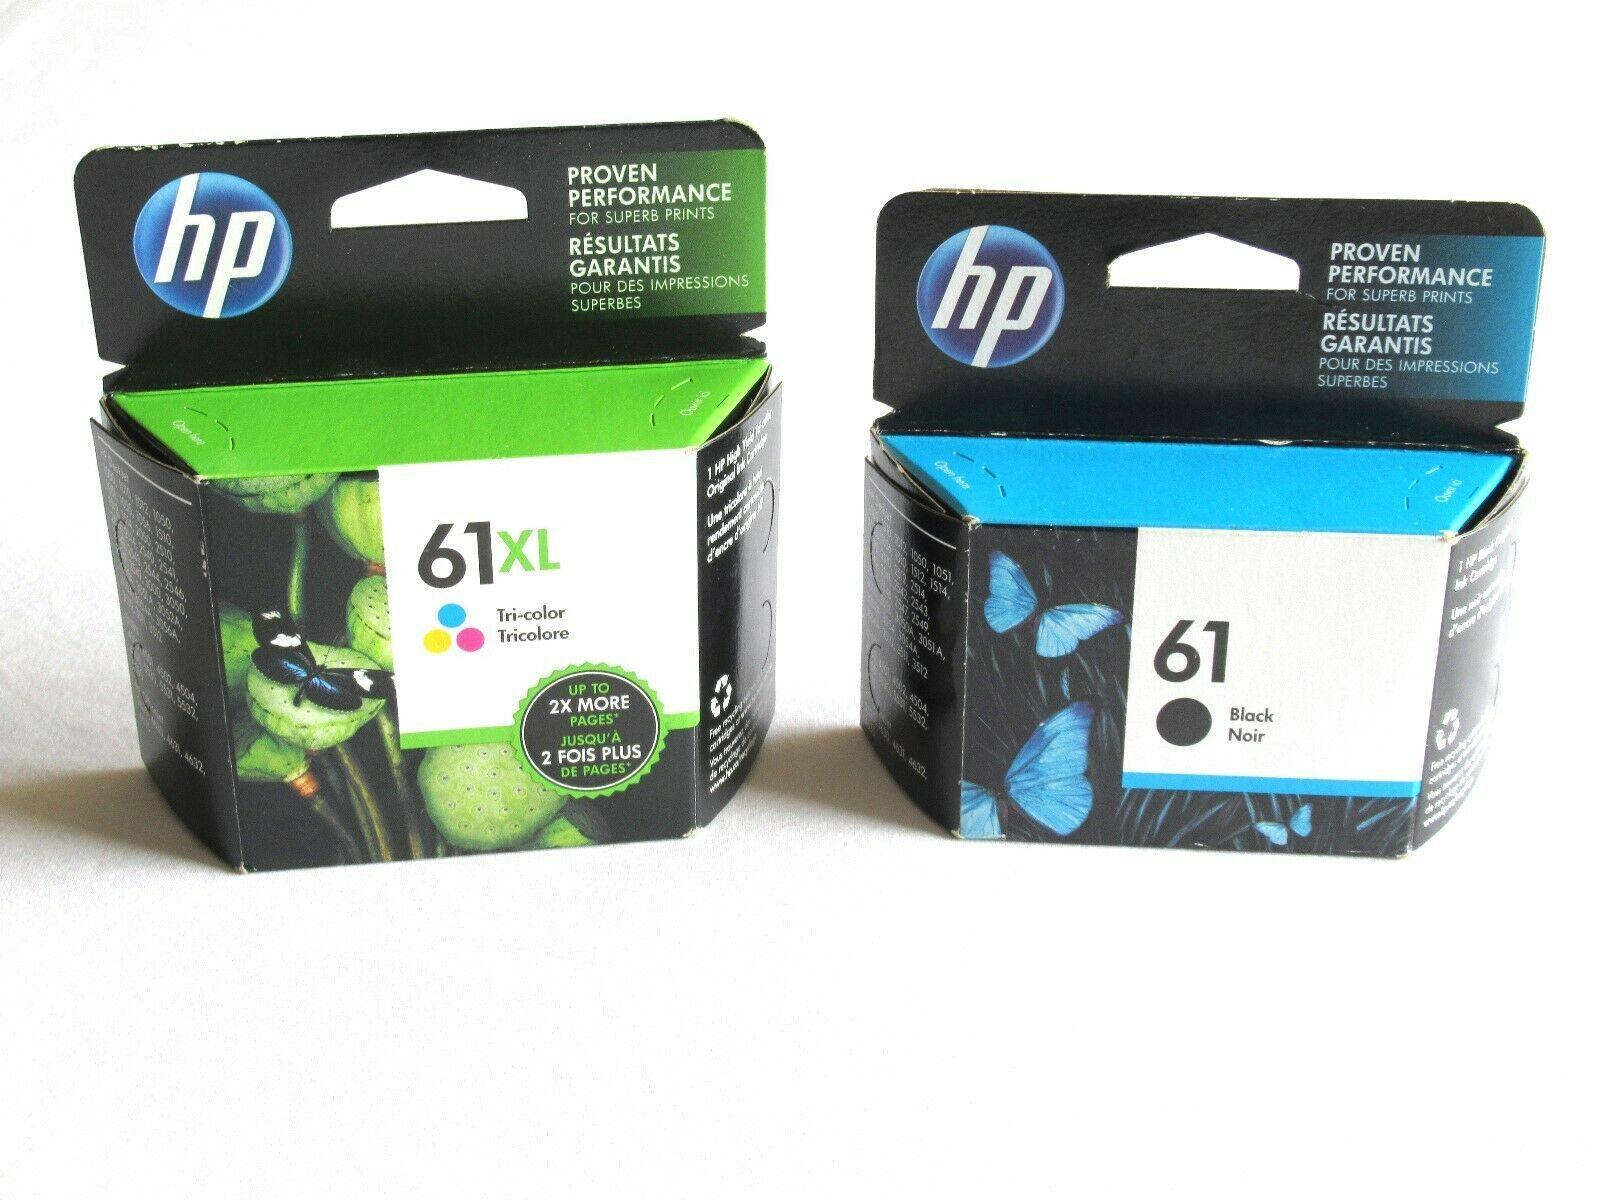 HP 57 Tri-color Ink Cartridge NEW SEALED EXP JUL 2019